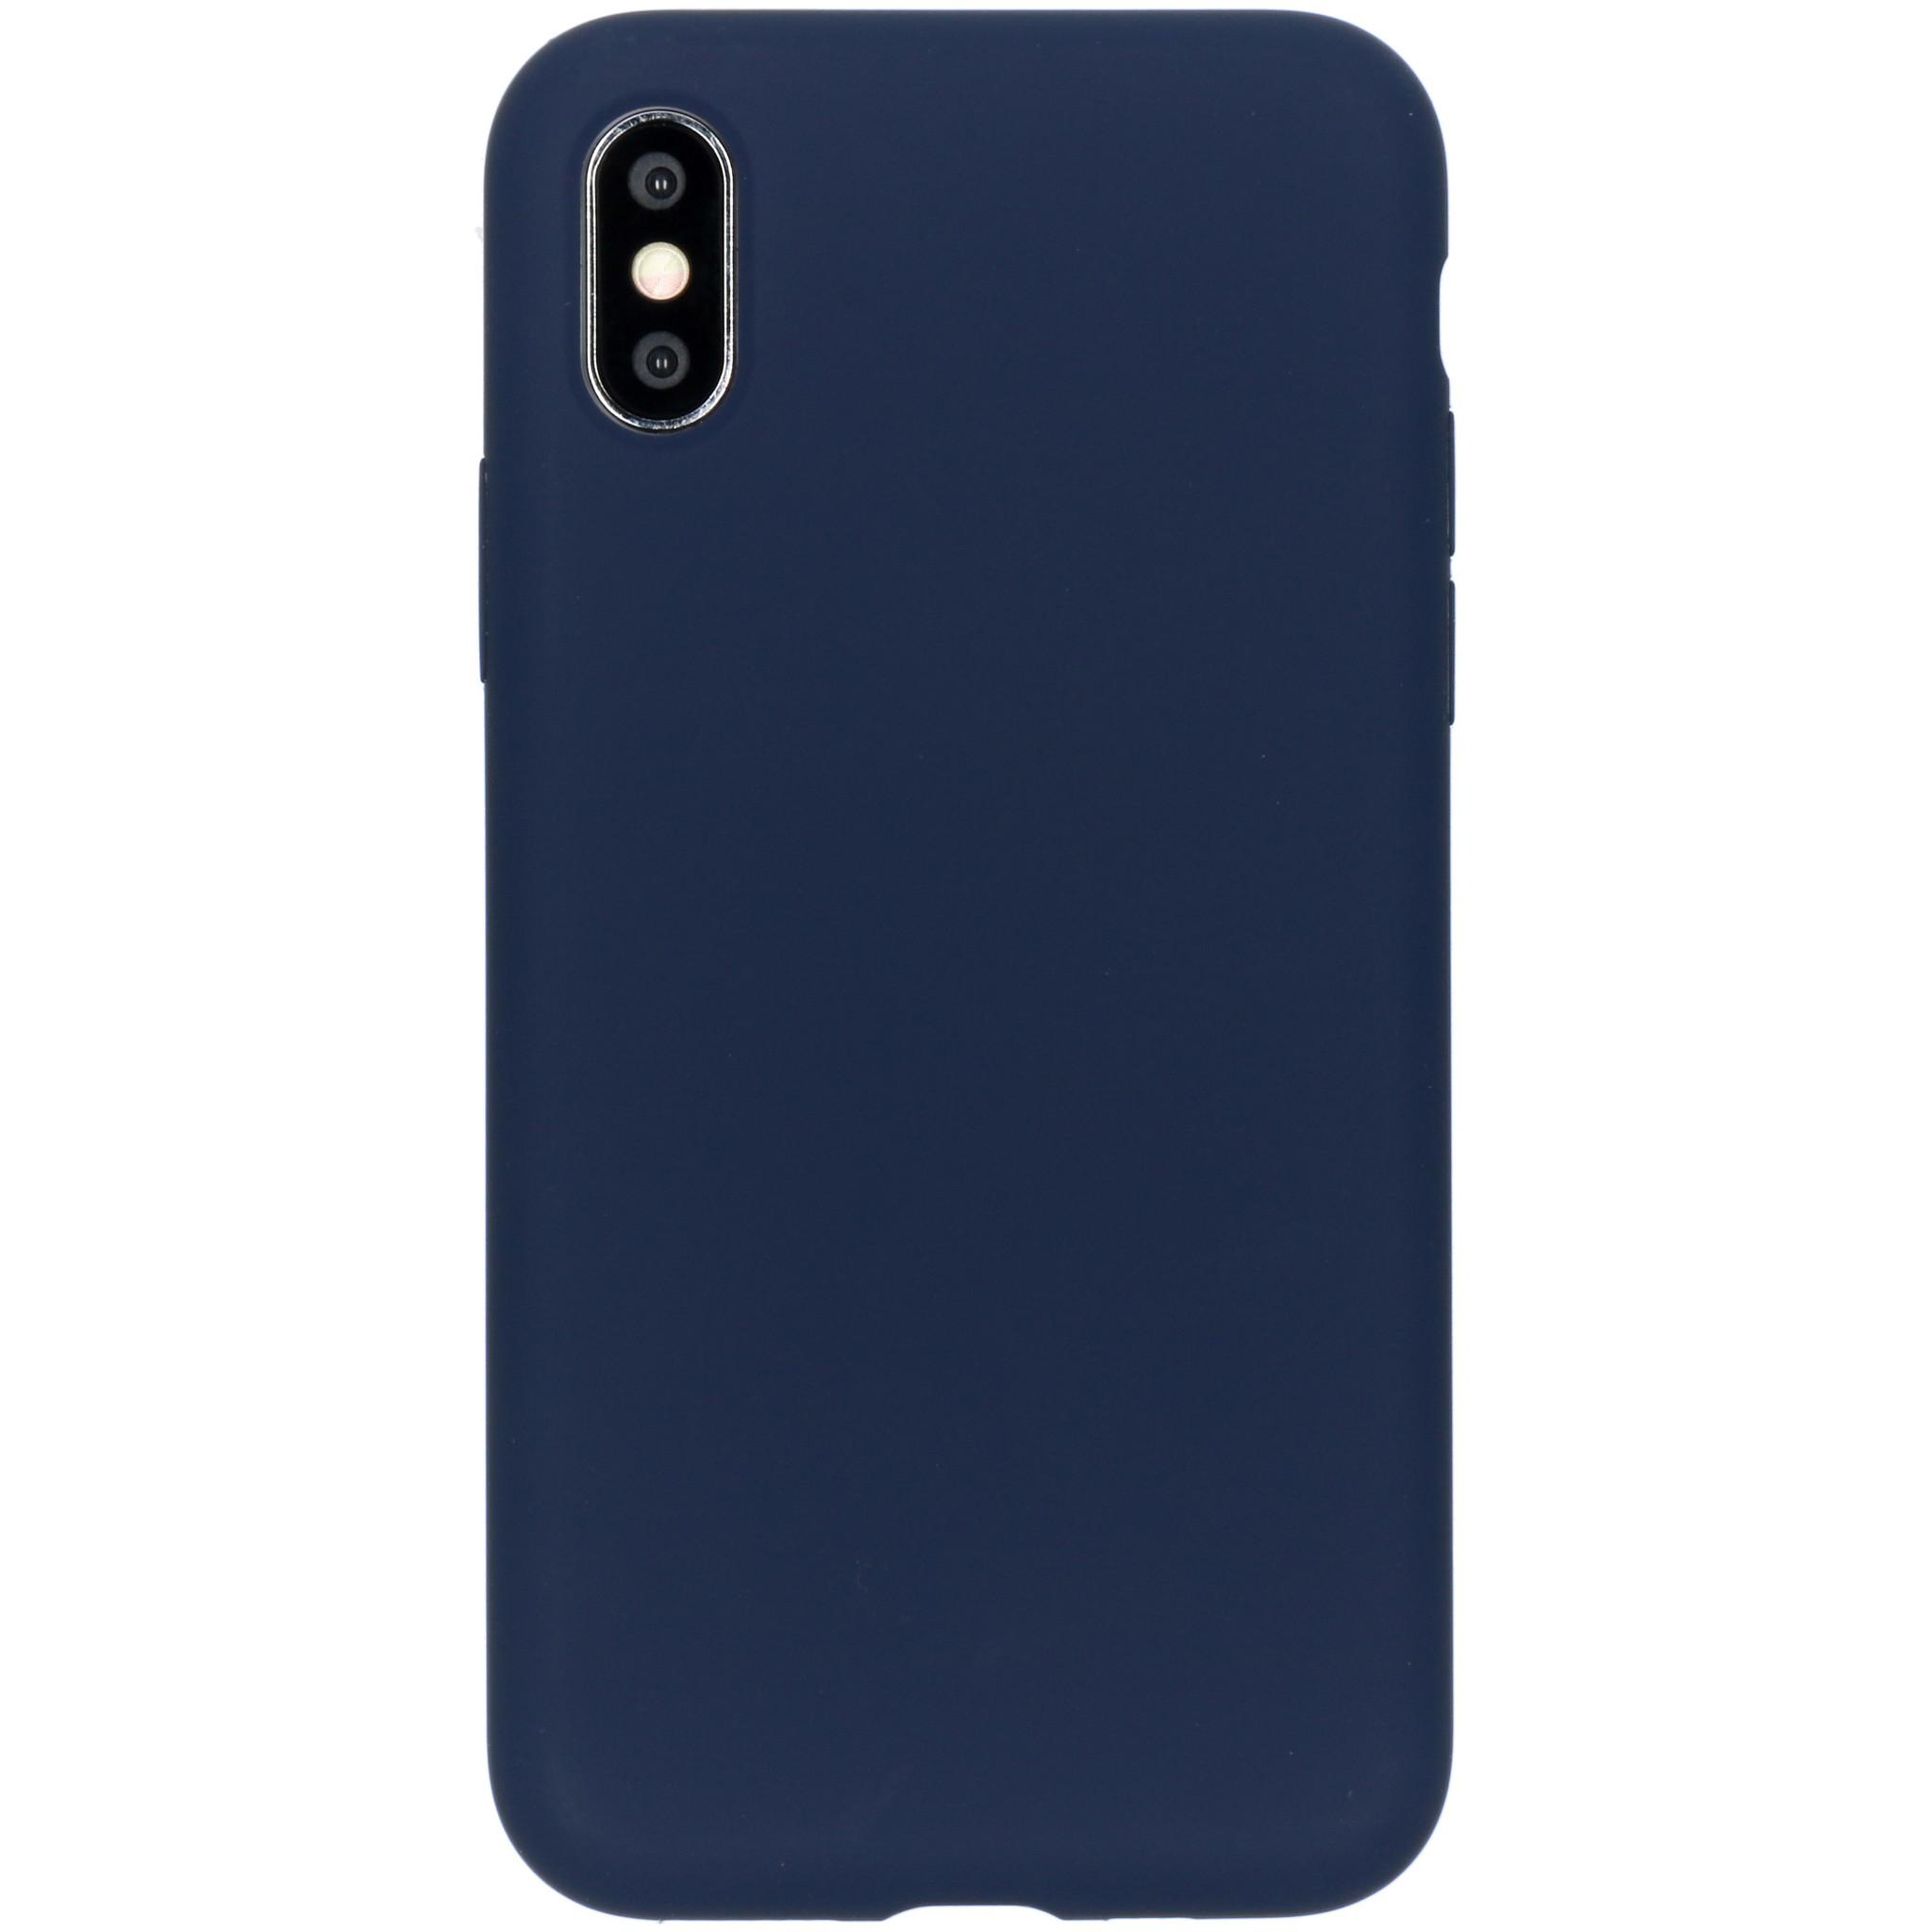 Accezz Liquid Silikoncase Blau für das iPhone Xs / X